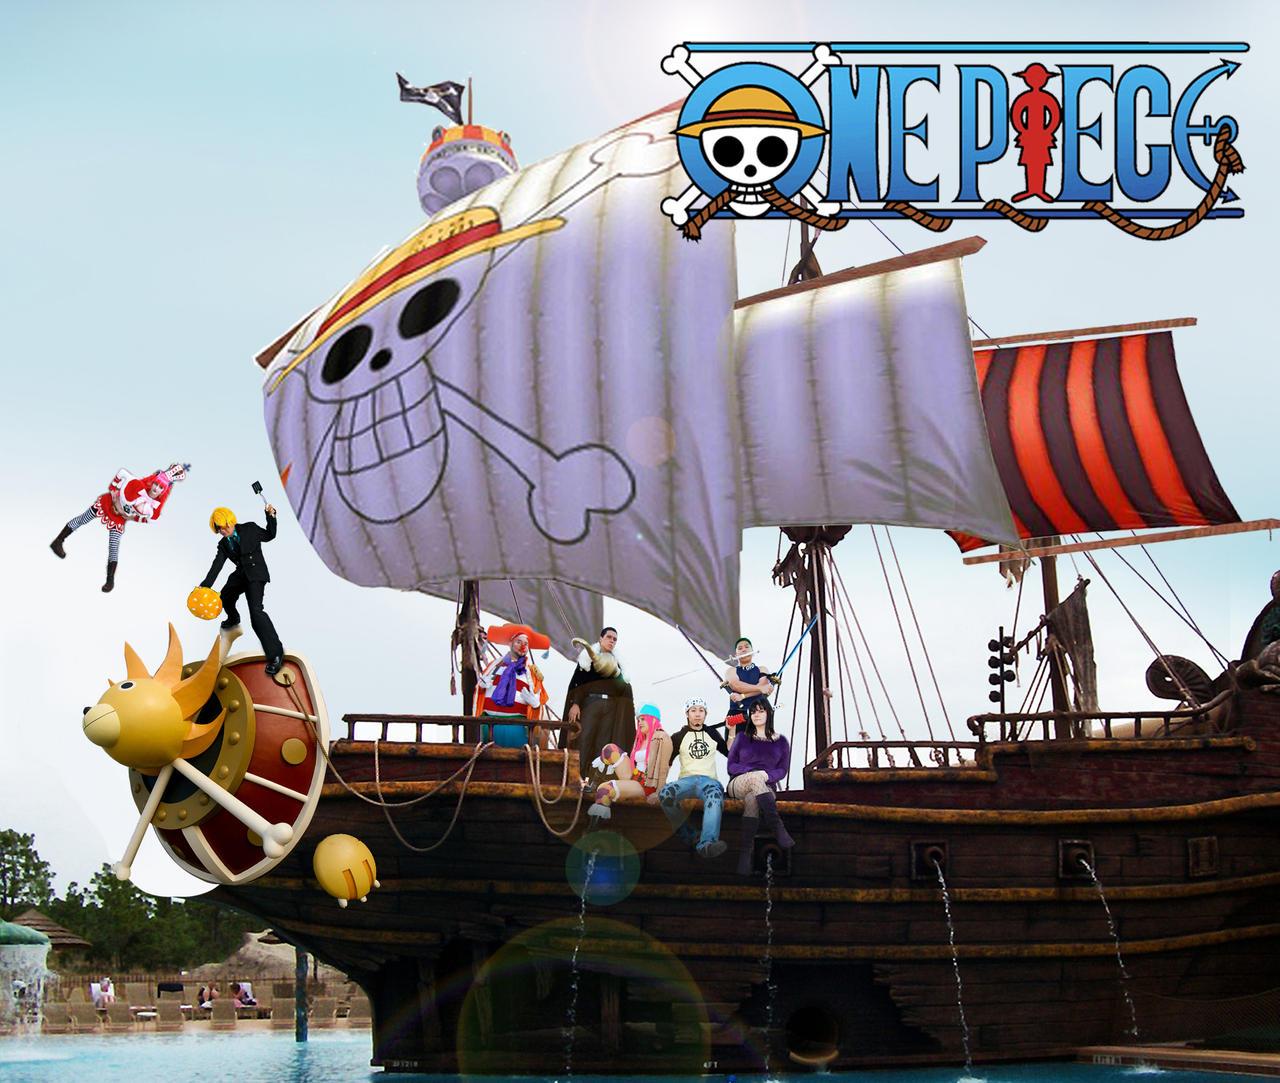 One Piece Ship by TewiBewi on DeviantArt